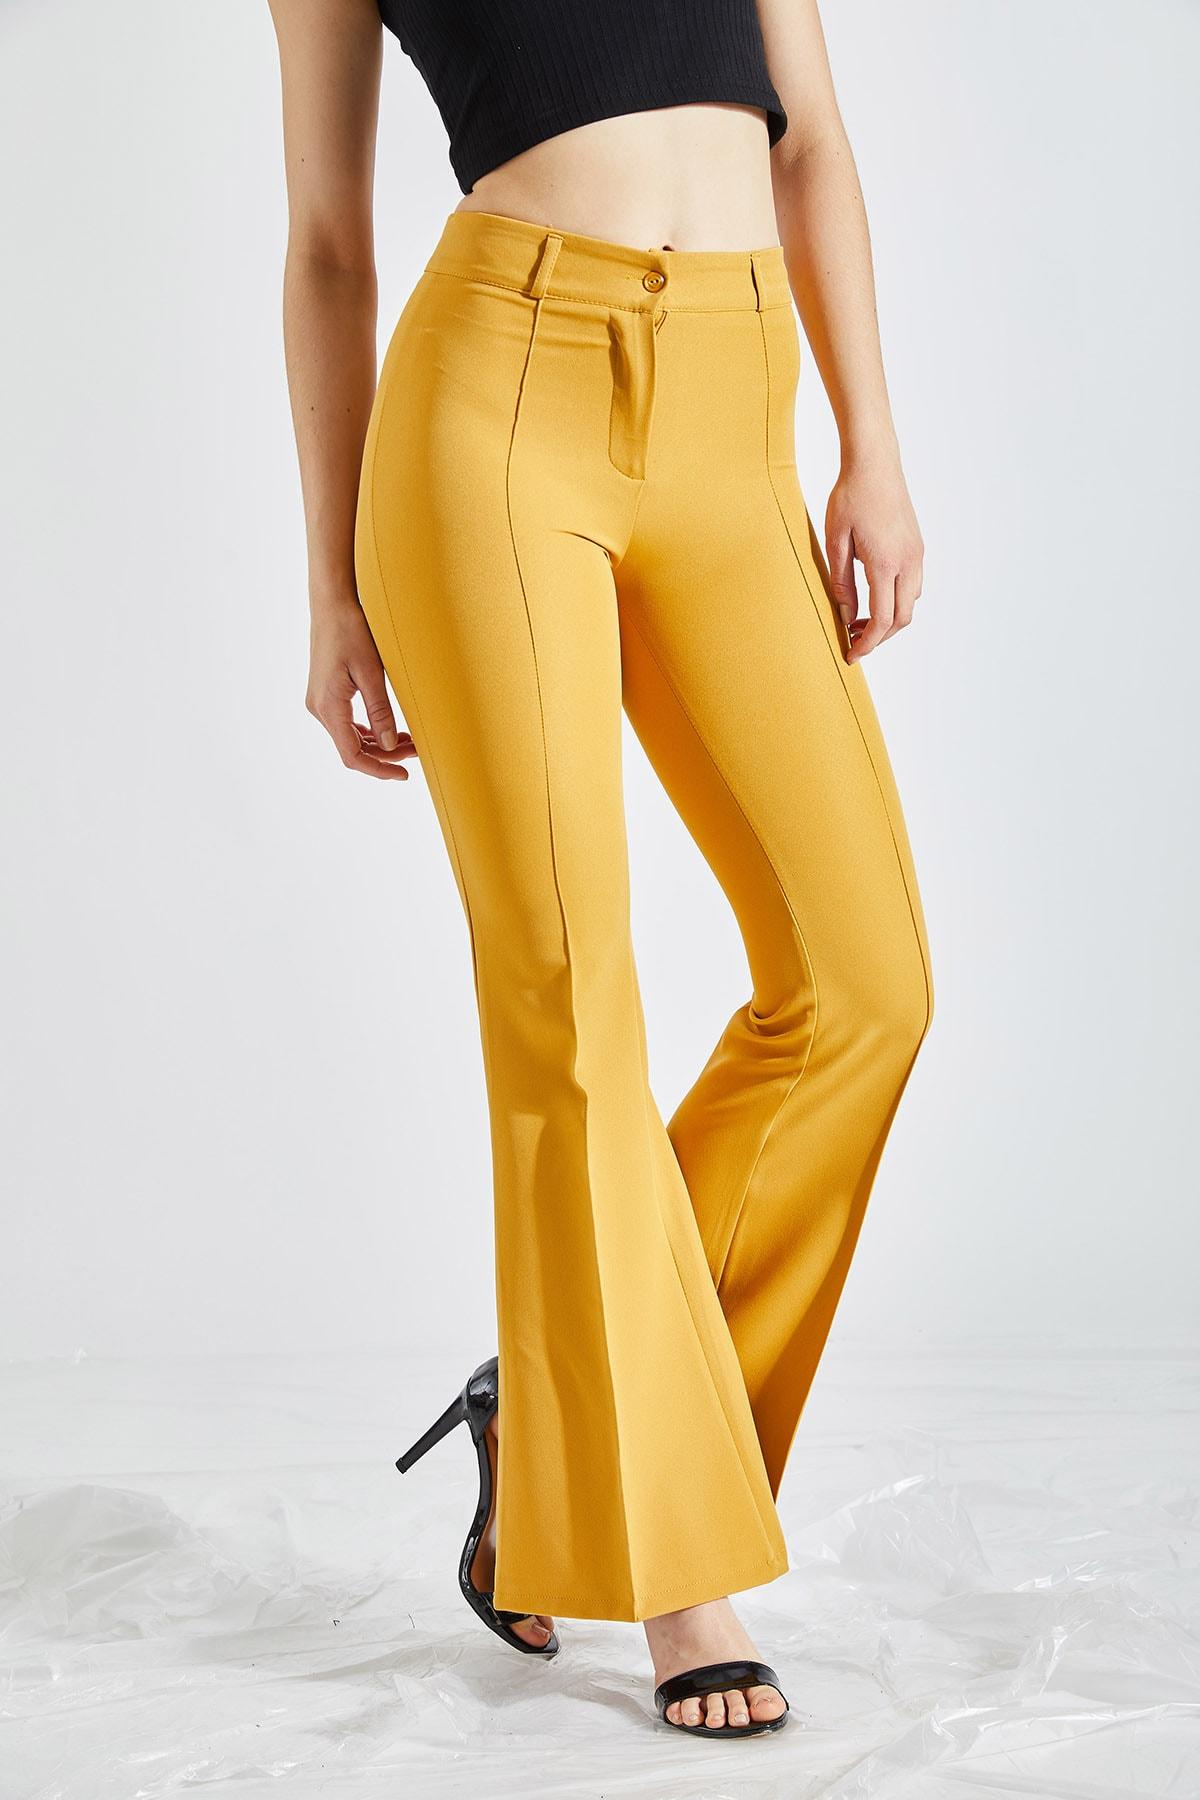 Kadın Sarı Ispanyol Paça Kumaş Pantolon